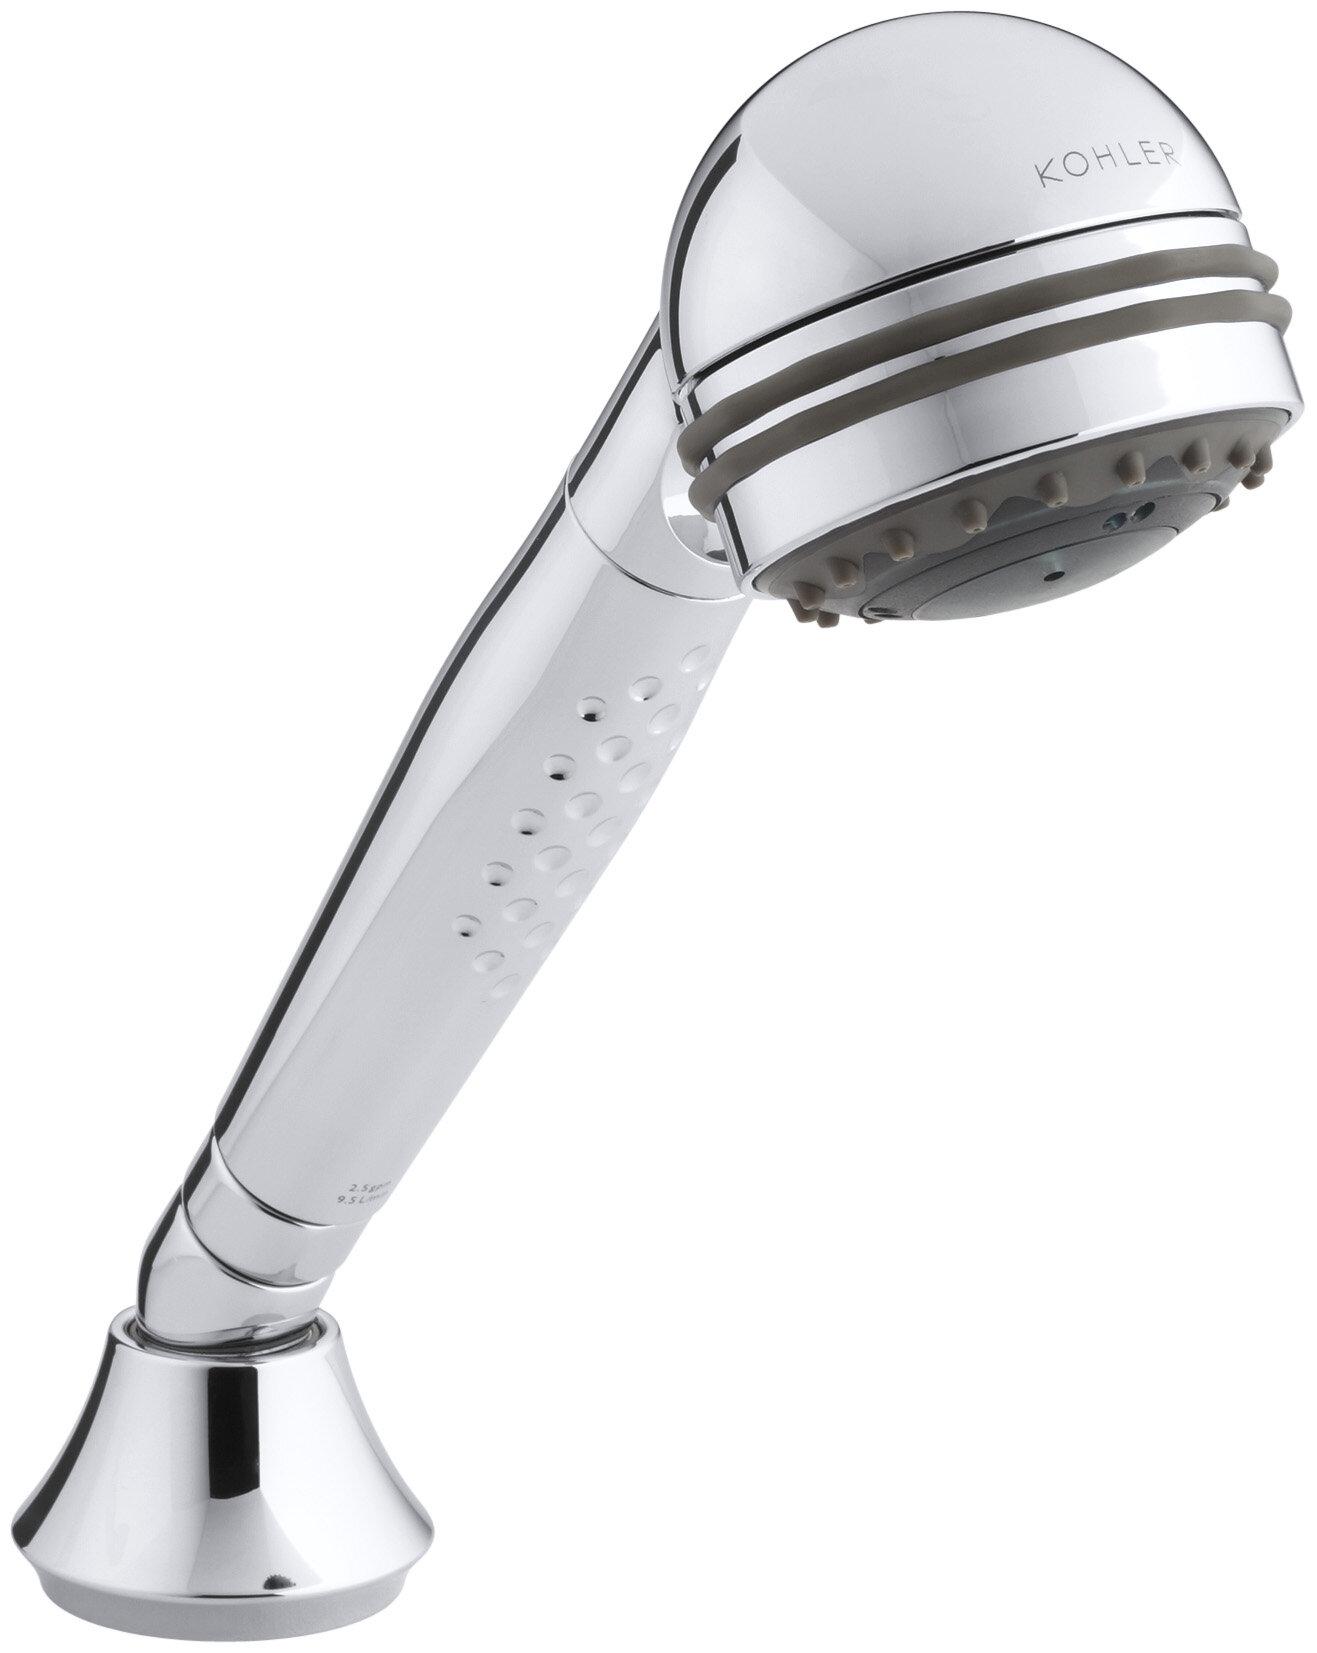 KOHLER Polished Chrome 1-in Head 2.5-GPM 2-Spray Multi-Function Hand Shower